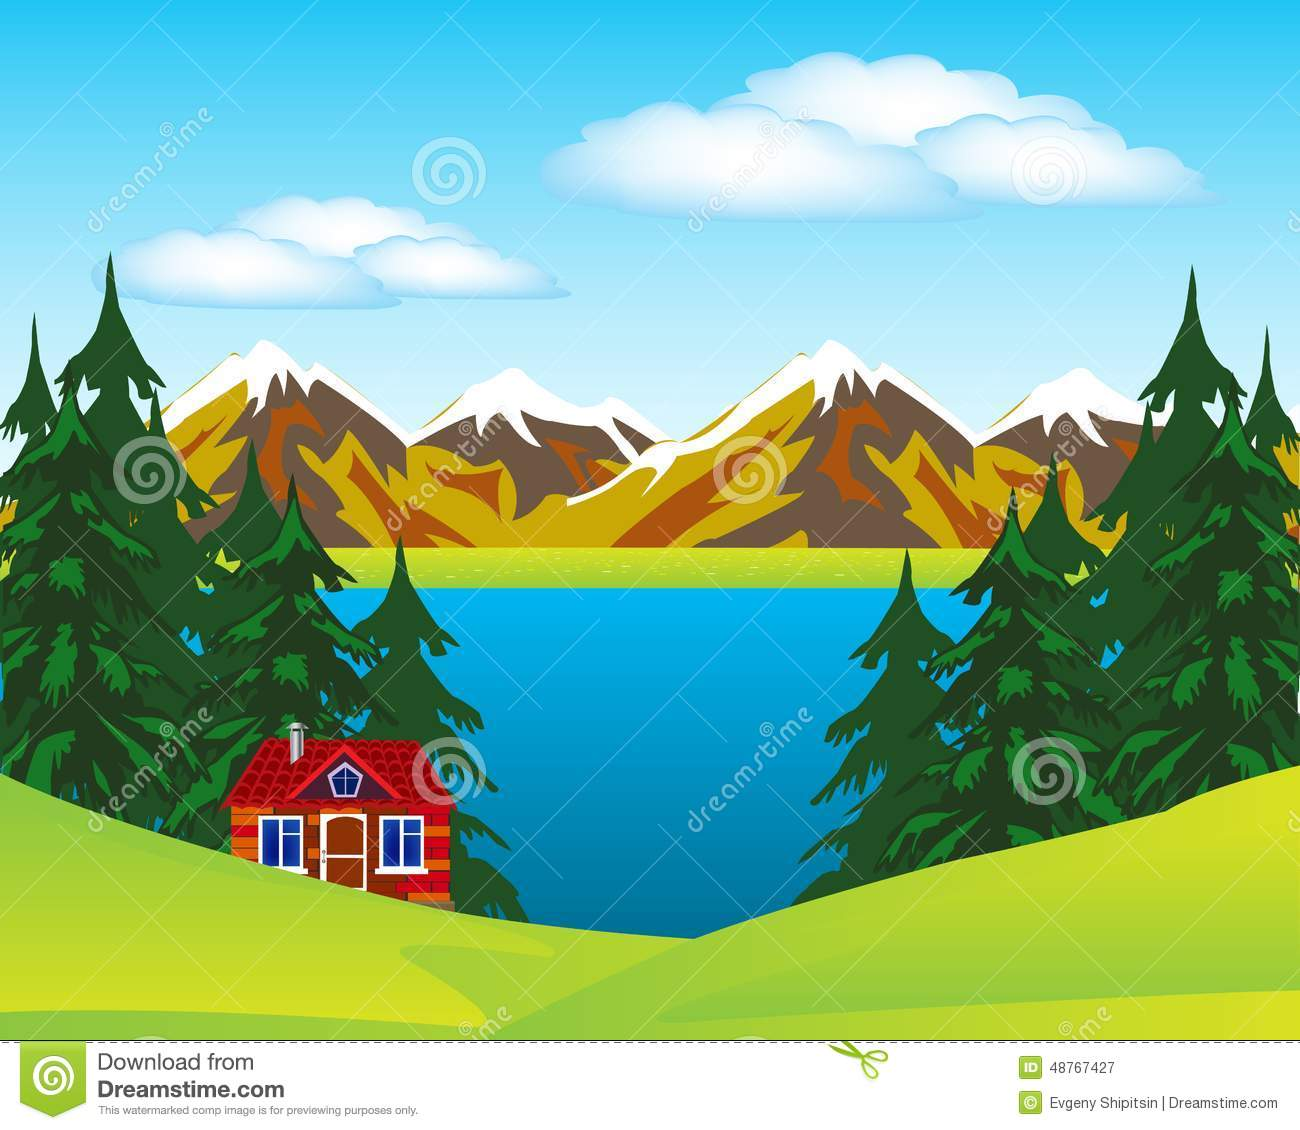 Lake house clipart.